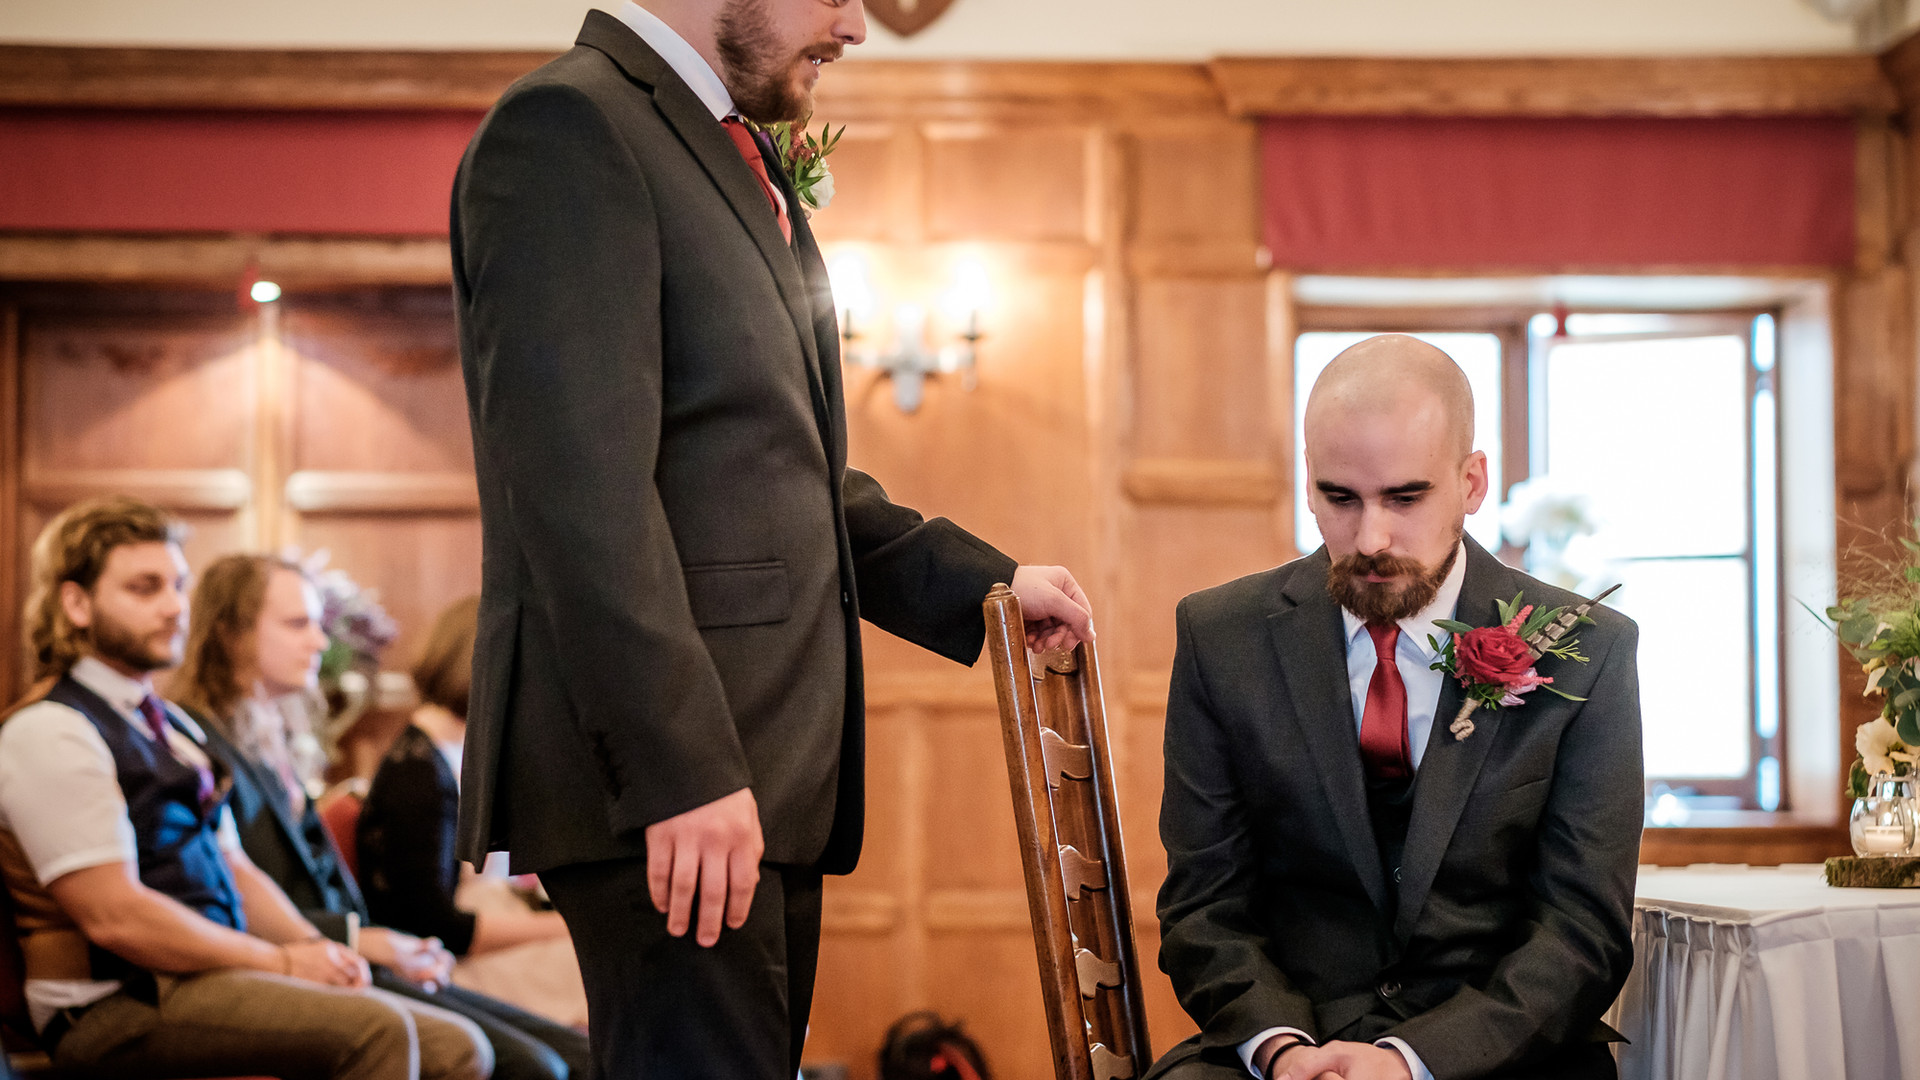 Laura and Matt - A Worcestershire Wedding